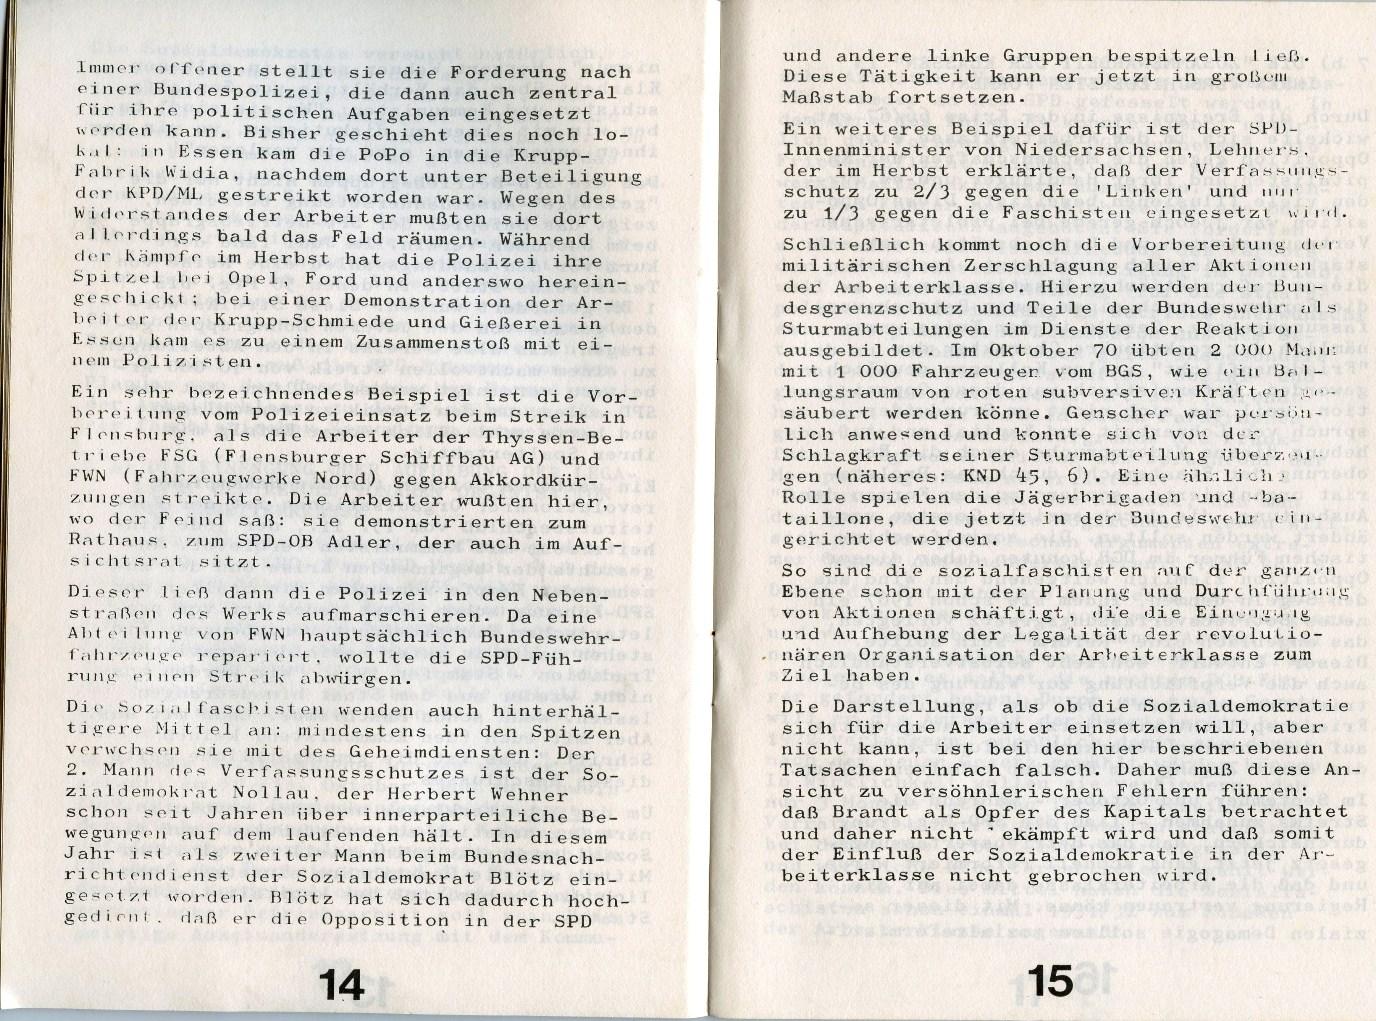 KJVD_Sozialdemokratie_Sozialfaschismus_1971_09